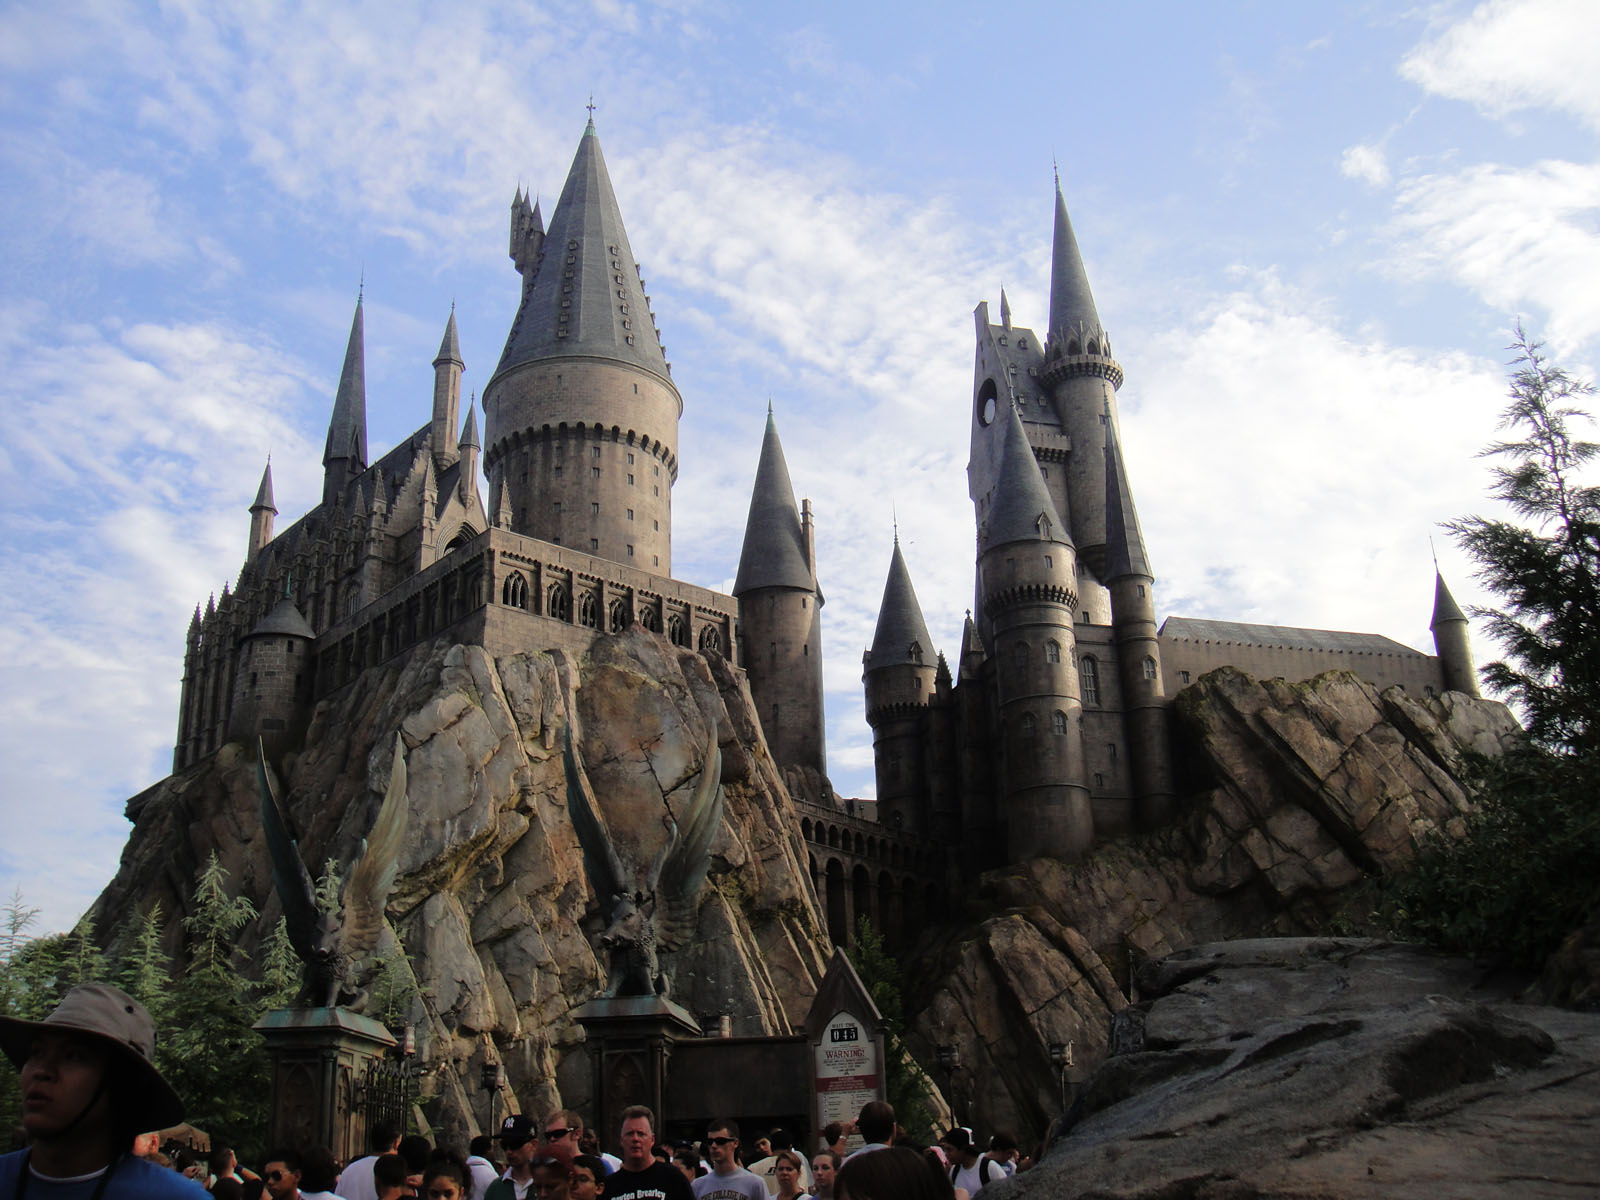 Wizarding World of Harry Potter - Hogwarts castle | Flickr ...